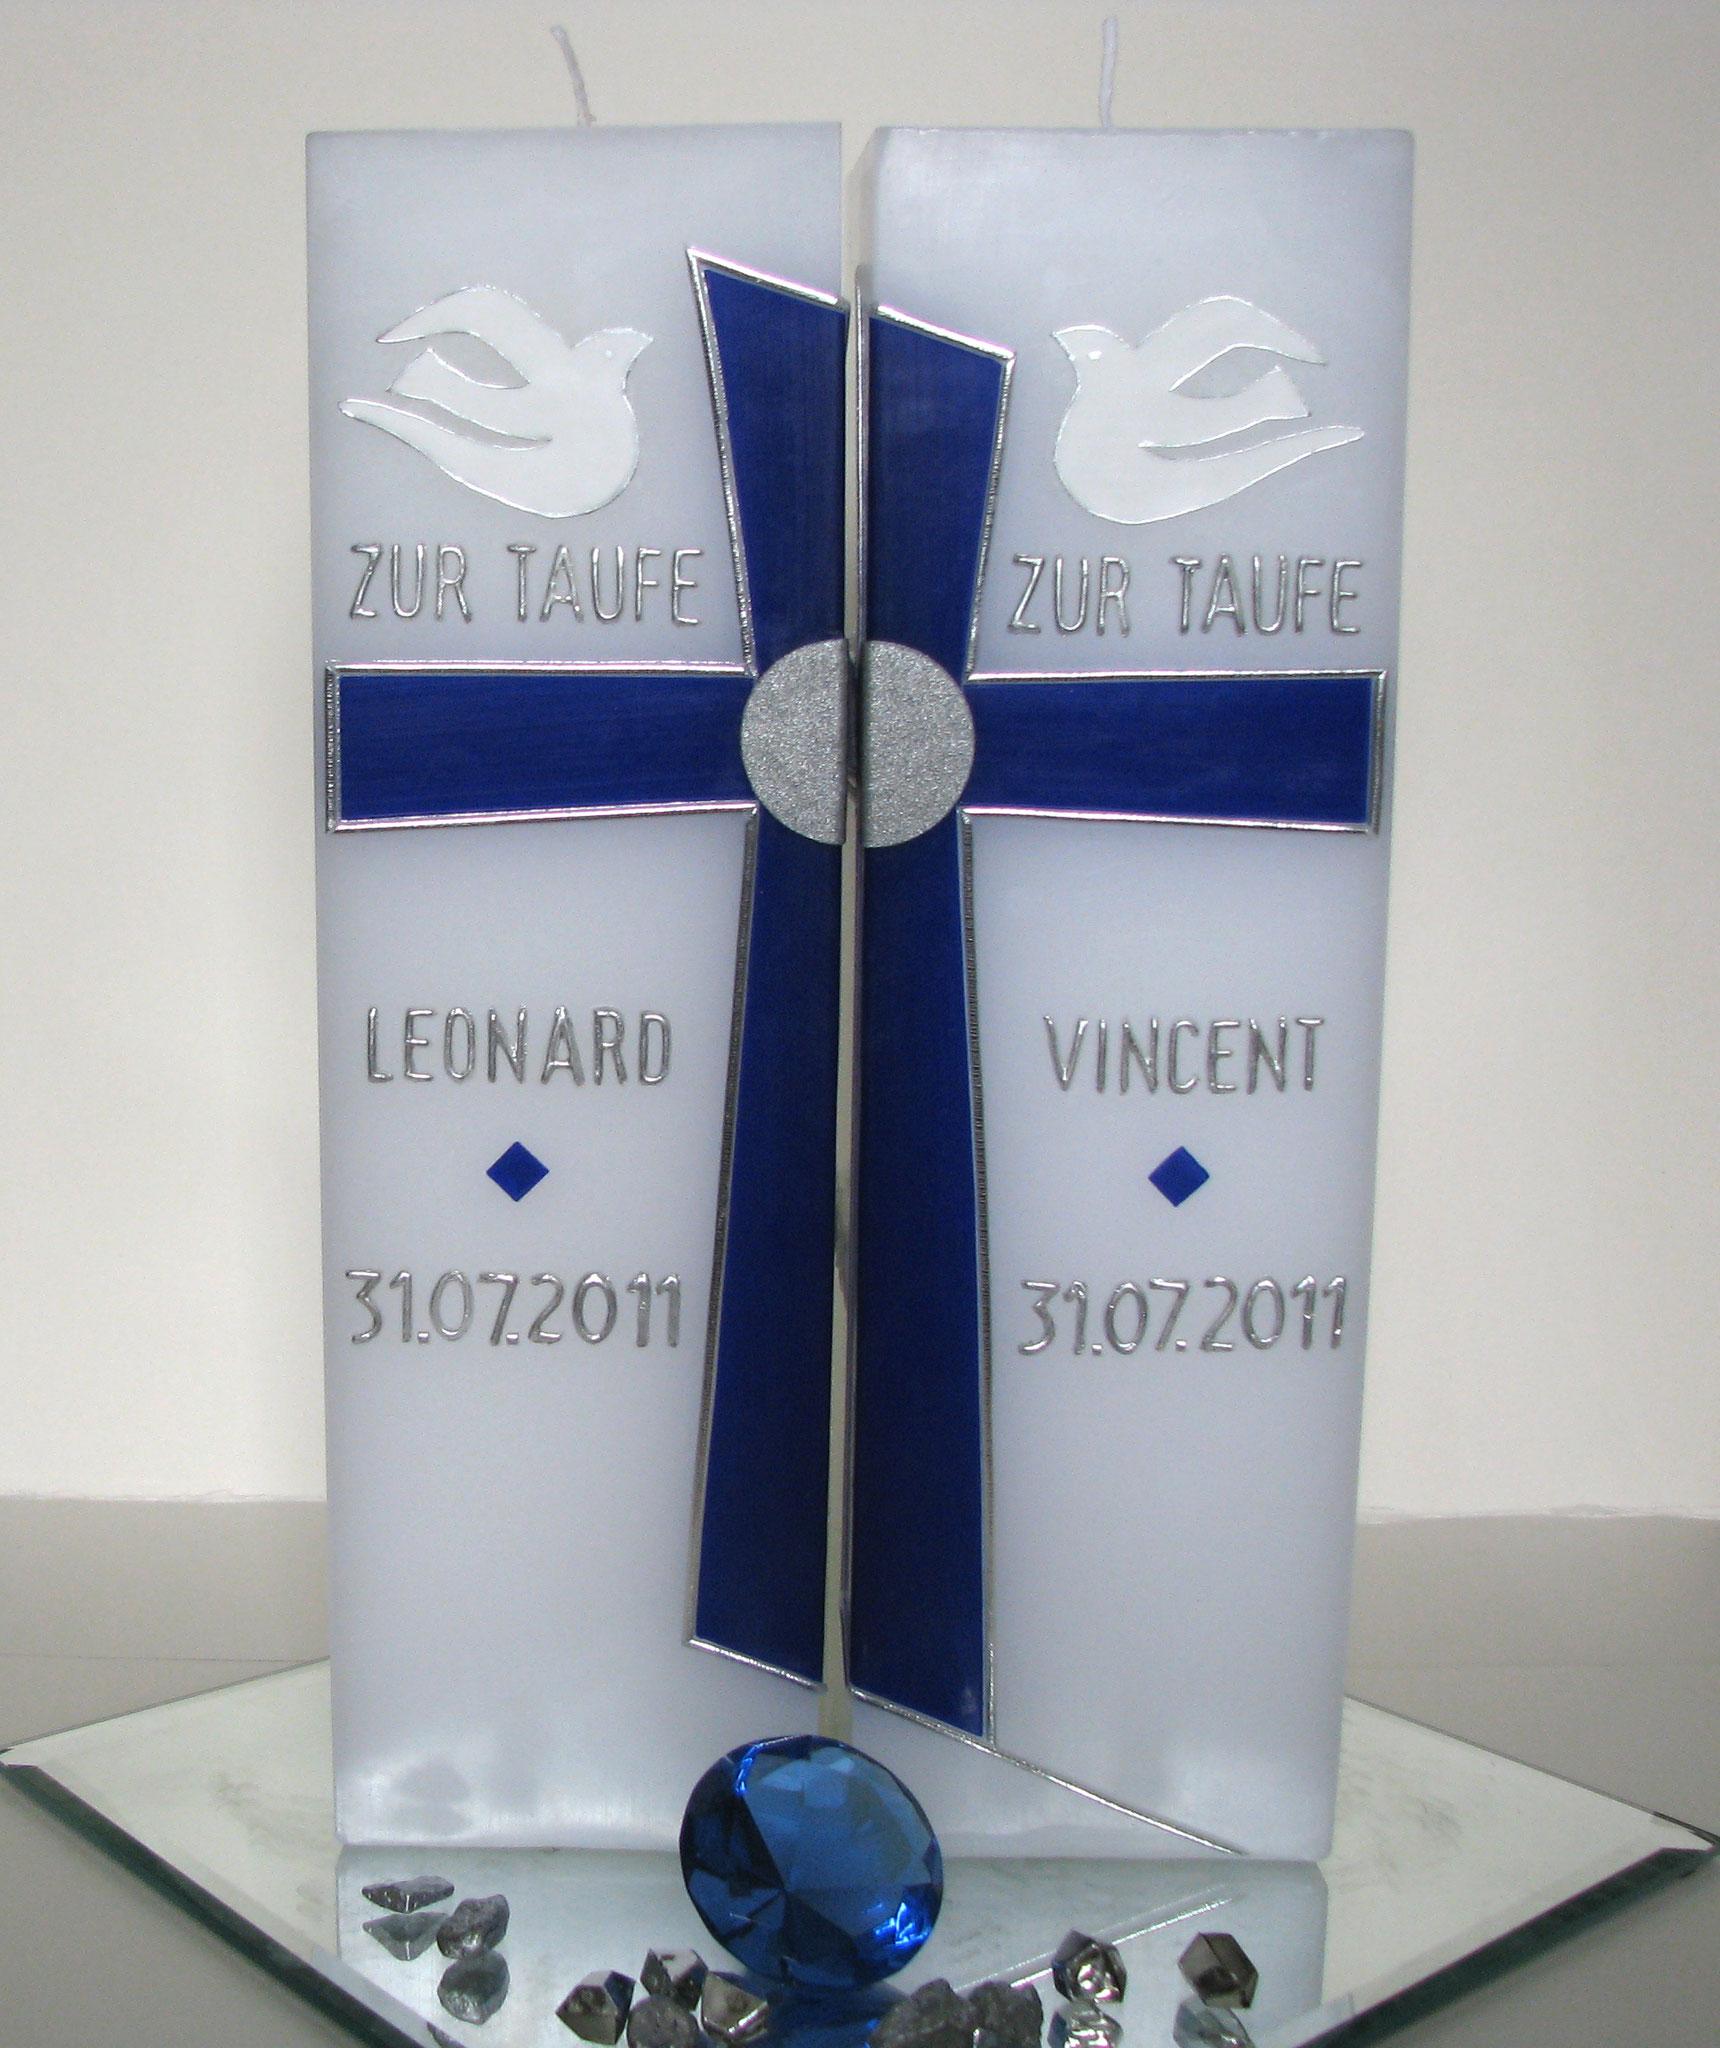 TE-3014, 2-teilig, HxB ca. 24 cm x 15 cm, Preis ca. € 82,--